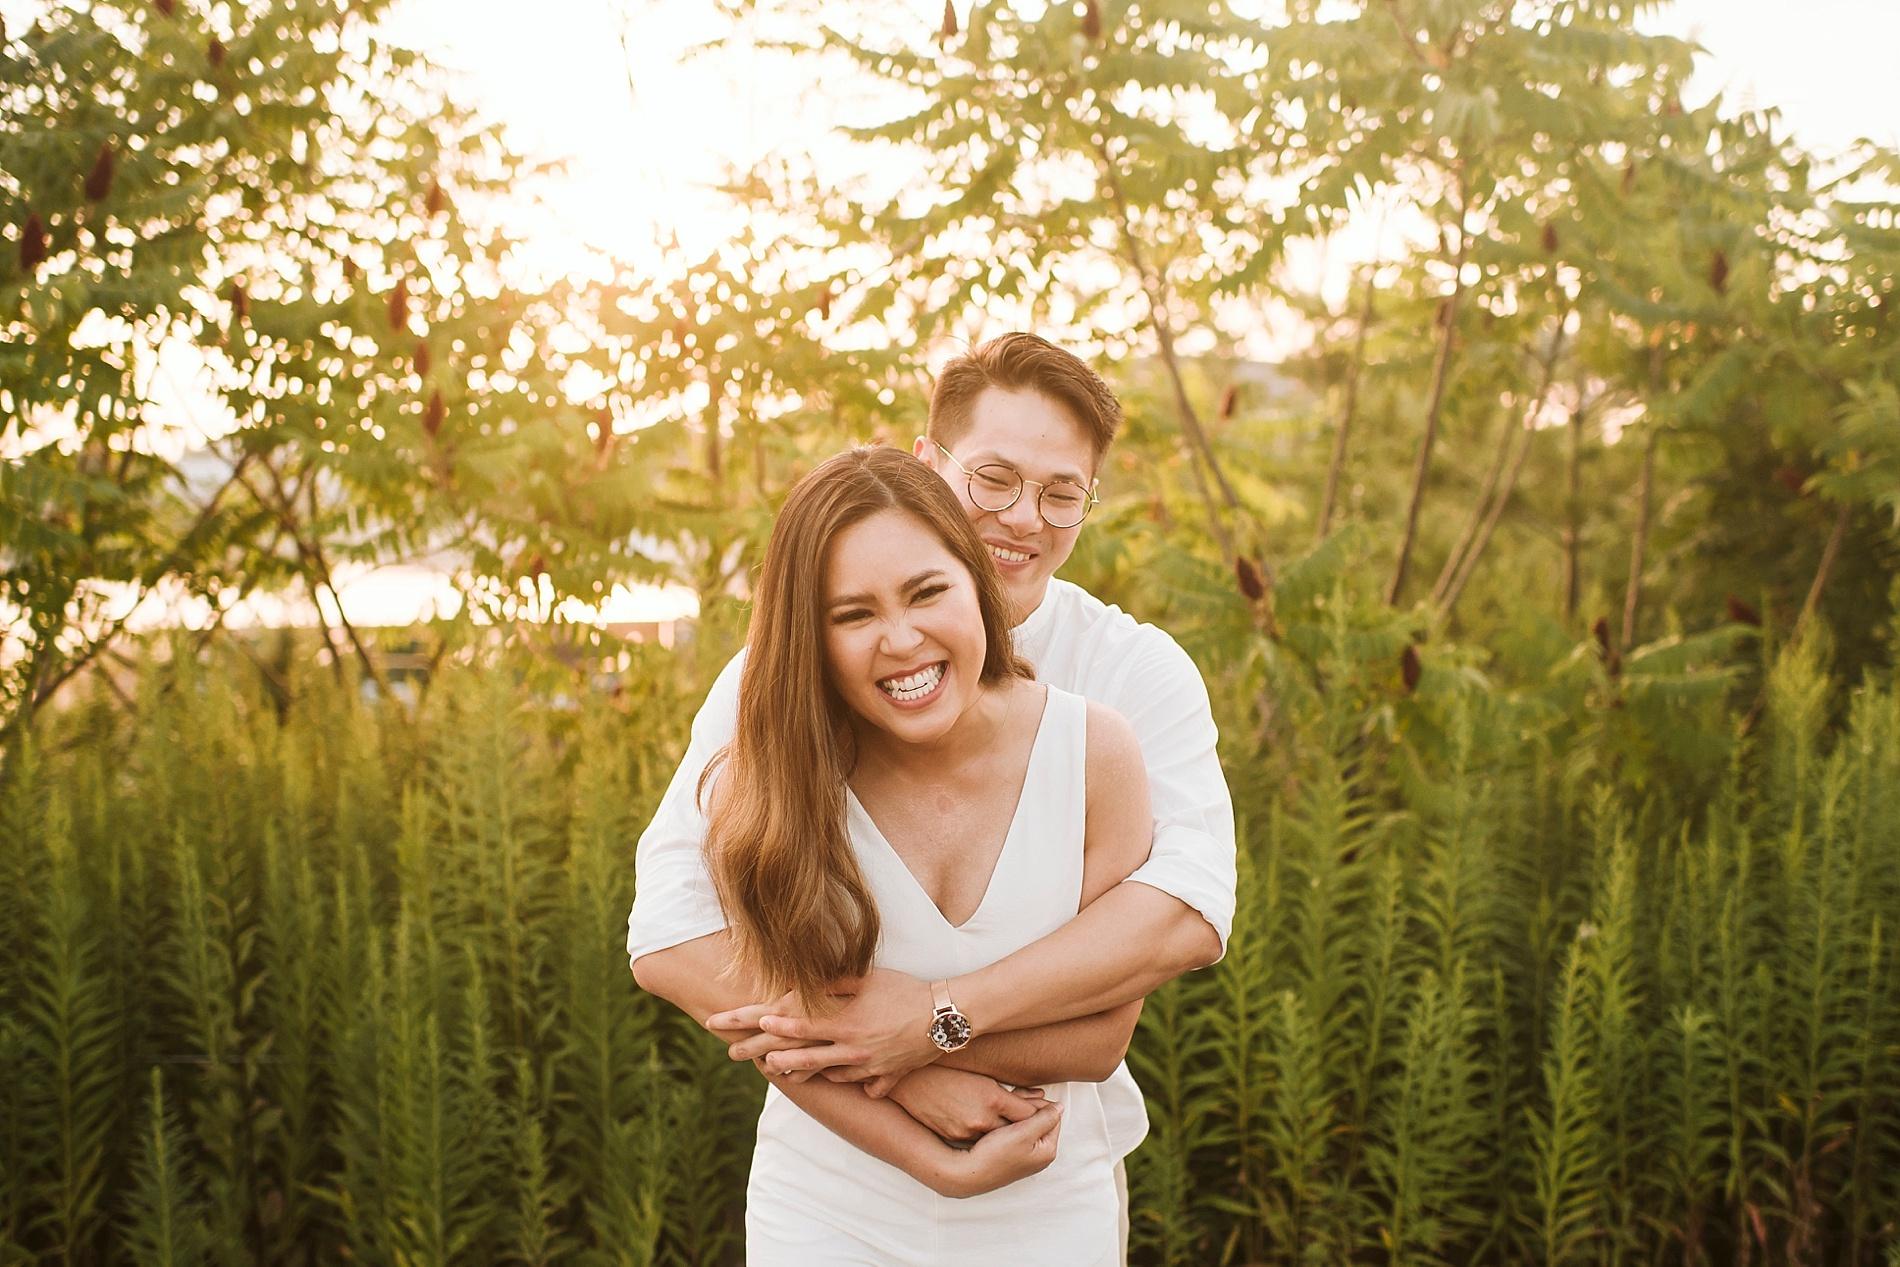 Toronto_Engagement_shoot_Ontario_Place_Lakeshore_0003.jpg